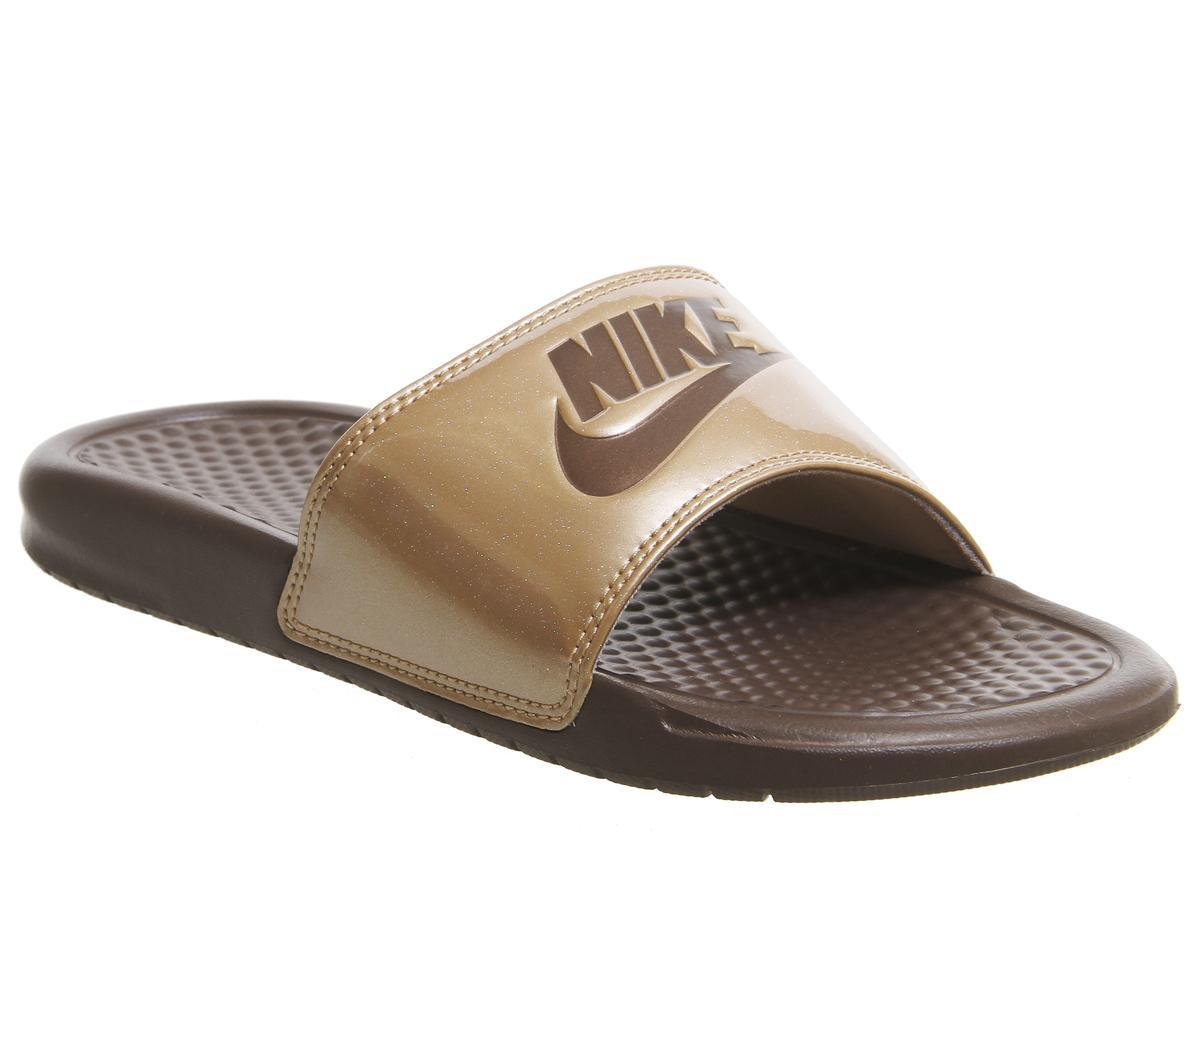 c0fcadcf39b7 Nike Womens Benassi Sliders Metallic Red Bronze Mahogany Mink - Sandals